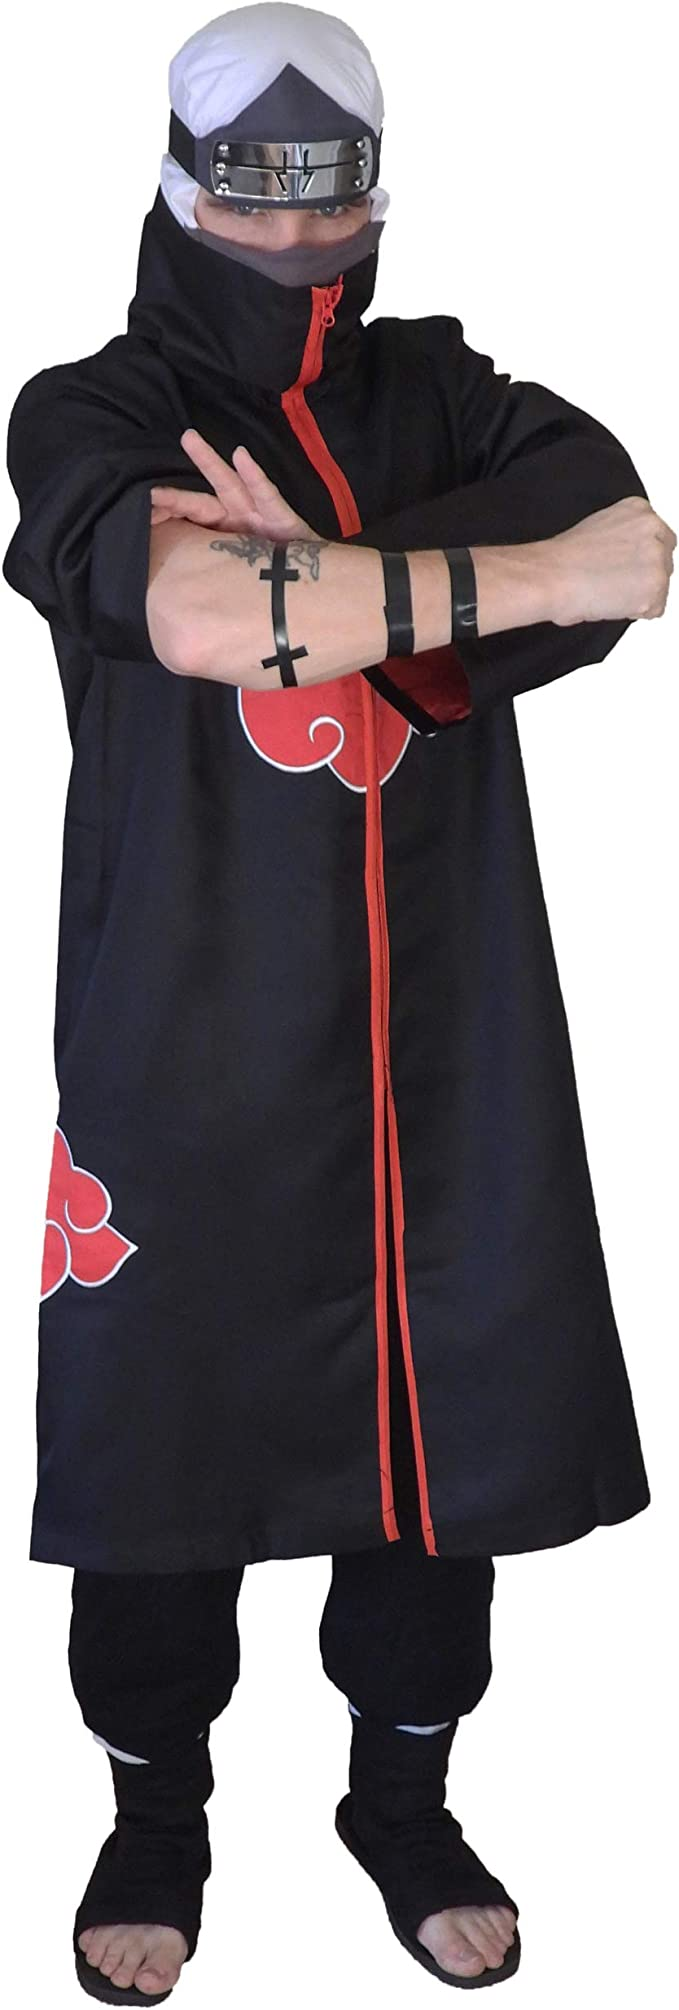 Amazon.com: DAZCOS - Disfraz de Akatsuki para cosplay ...